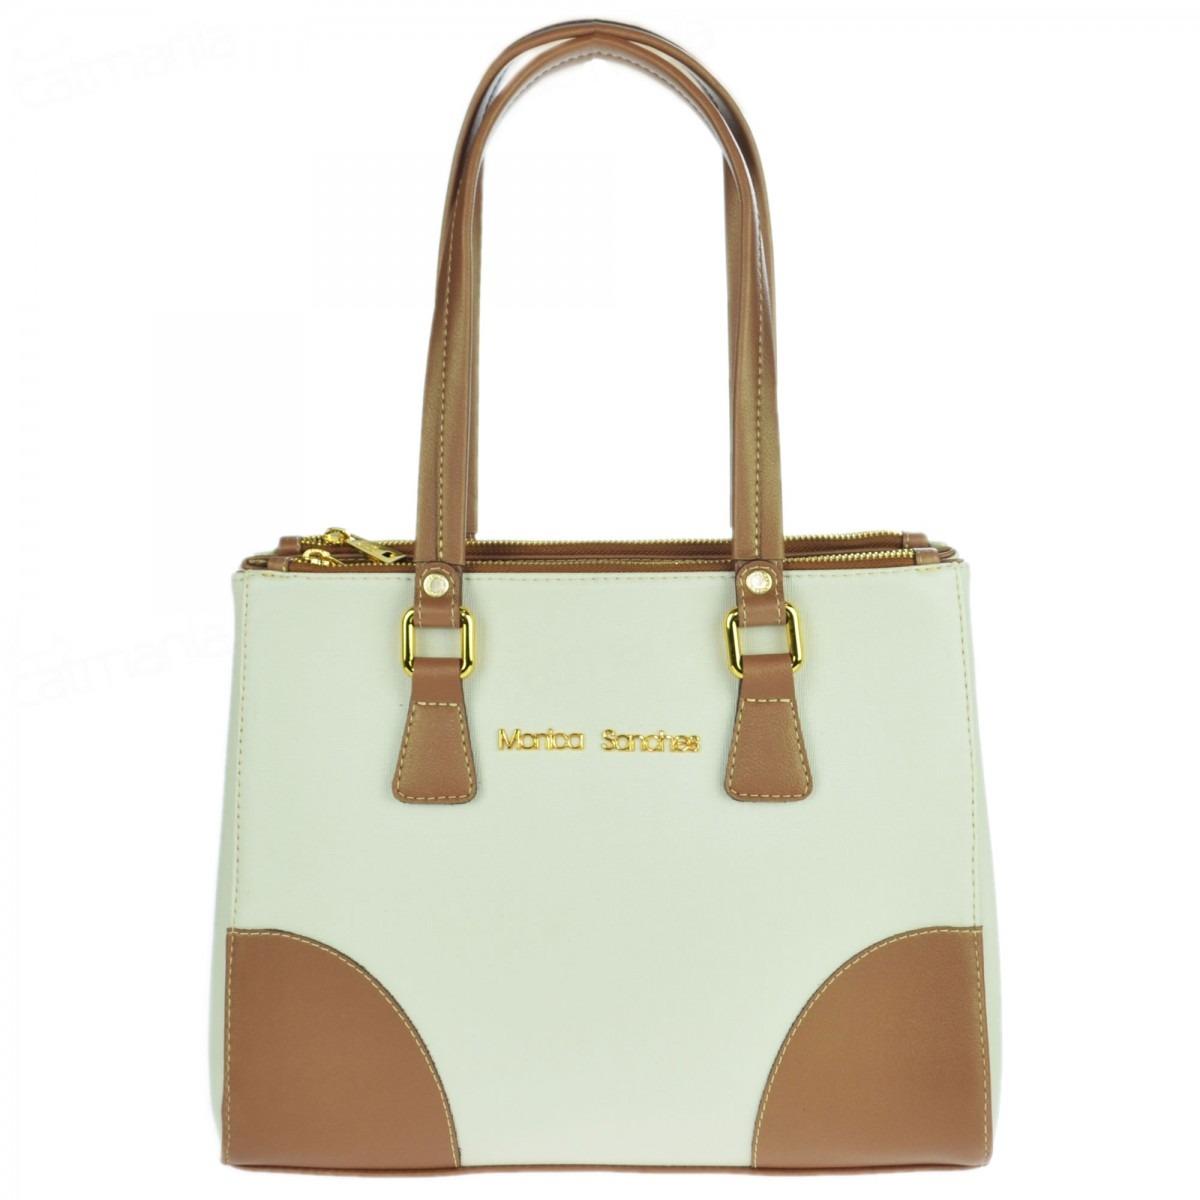 Bolsa Feminina Monica Sanches - 3002b  6011ae53913